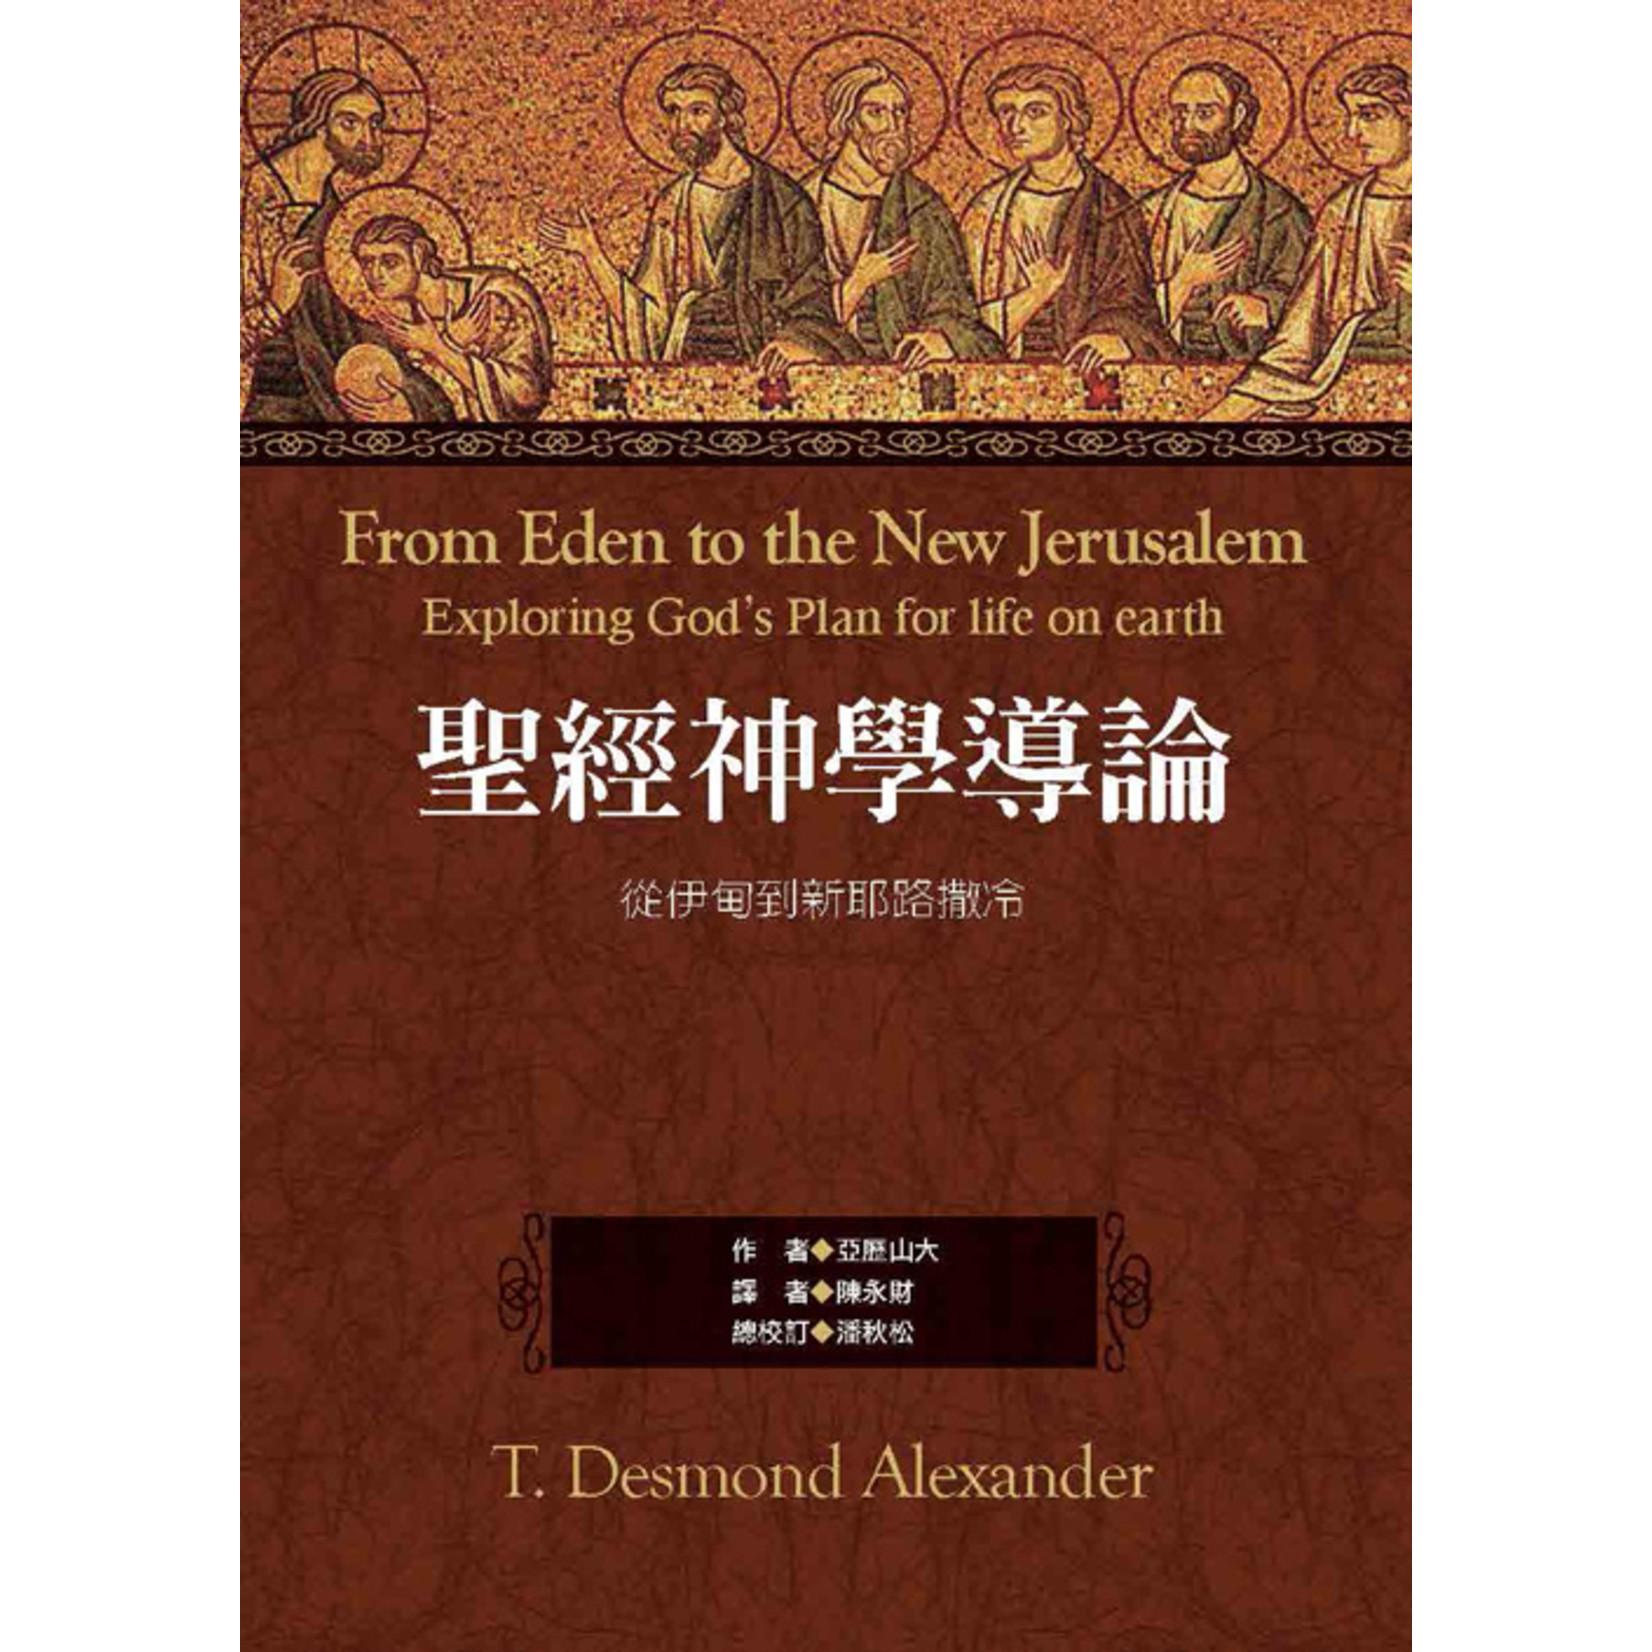 美國麥種傳道會 AKOWCM 聖經神學導論:從伊甸到新耶路撒冷 From Eden to the New Jerusalem--Exploring God's Plan for life on earth